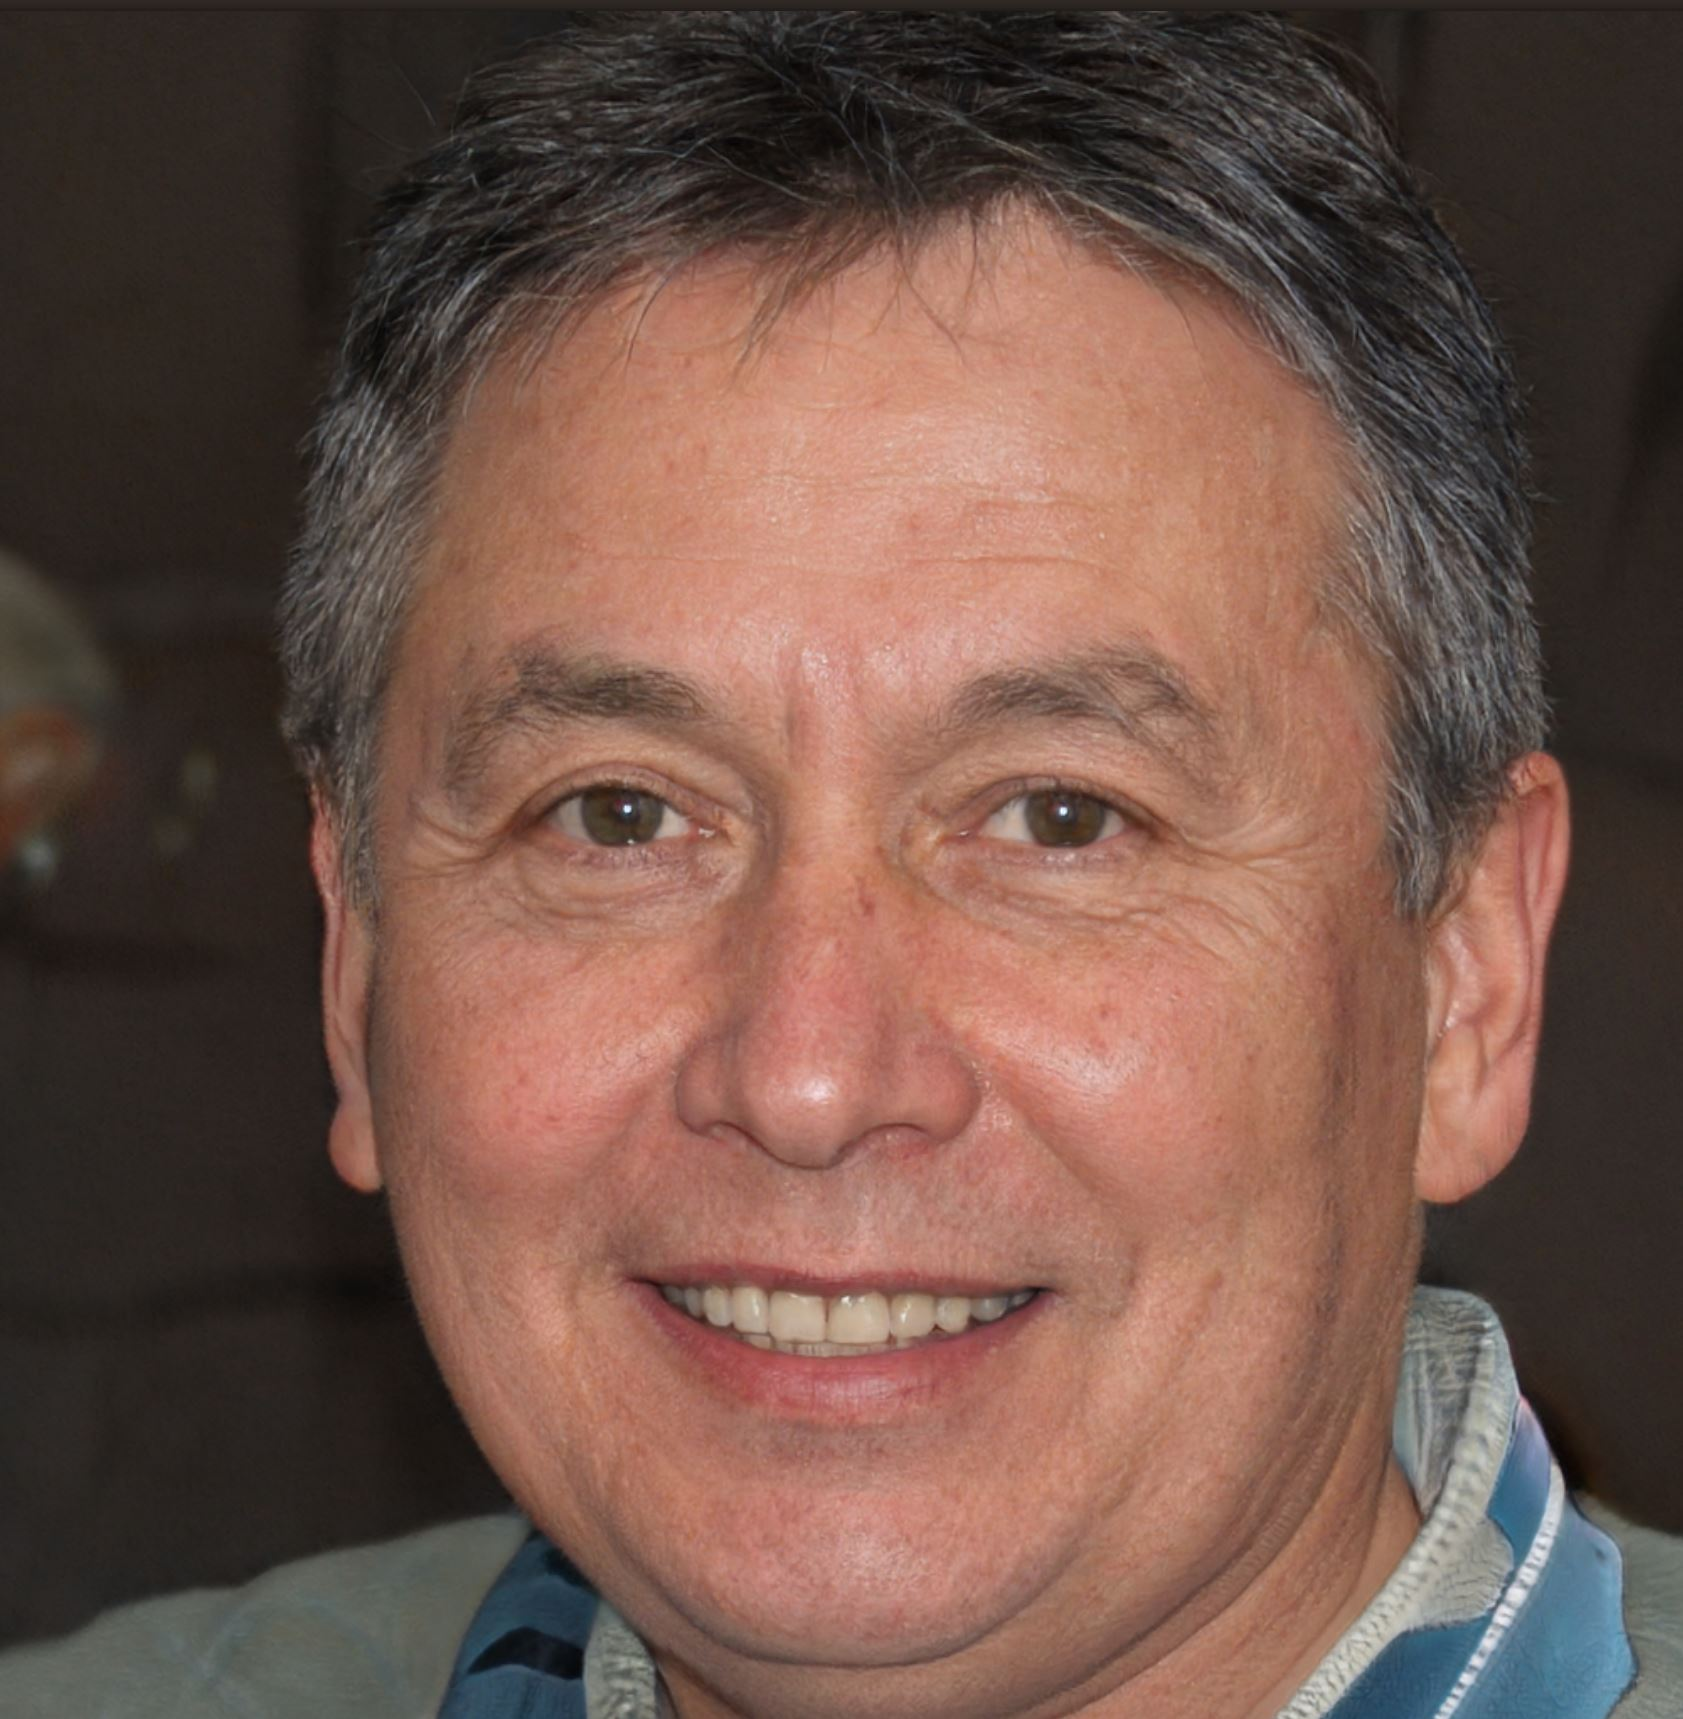 Jan Zuidweghe